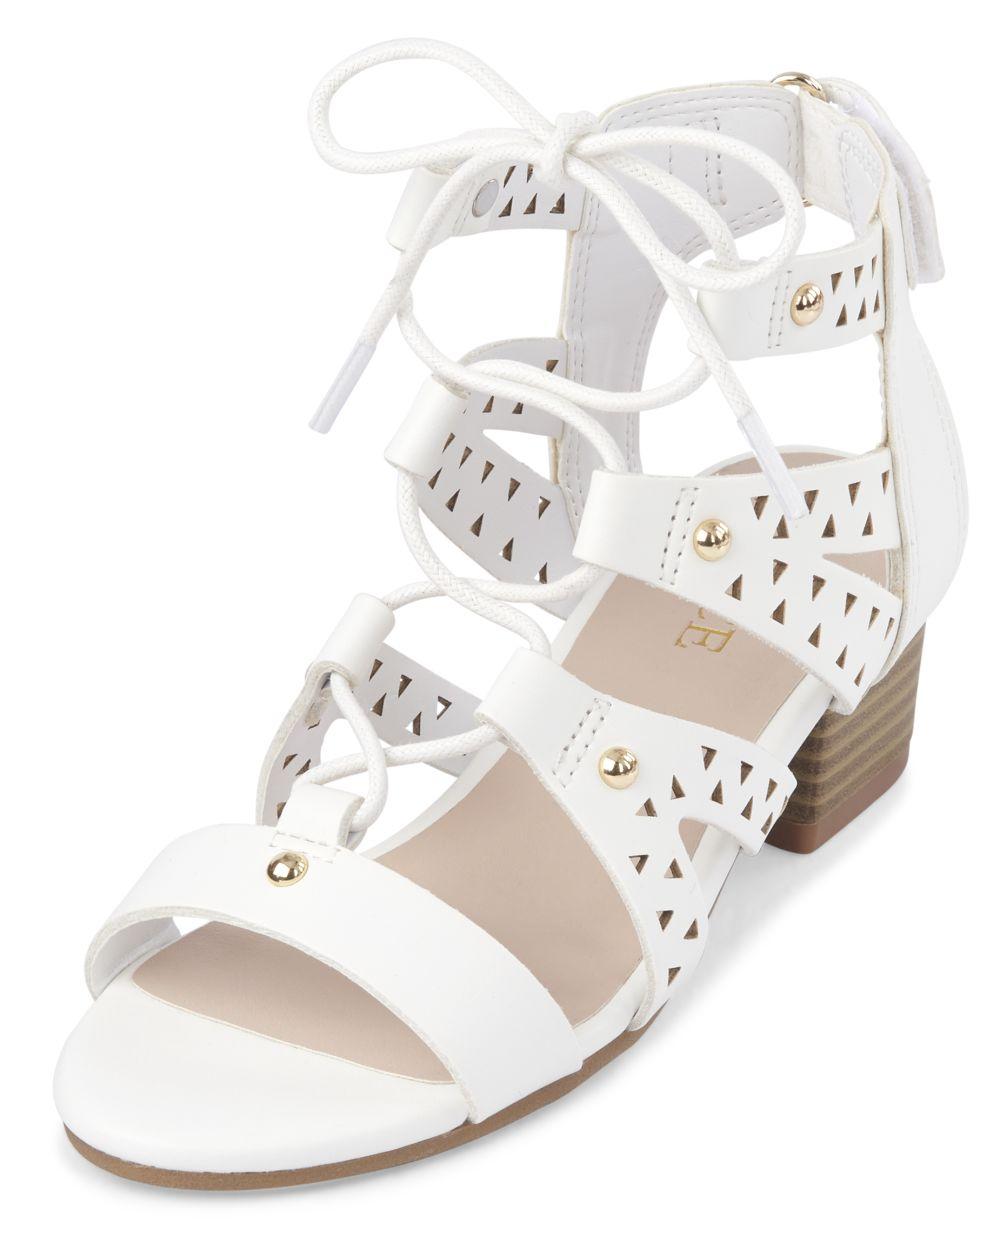 Girls Laser Cut Lace Up Low Heel Sandals